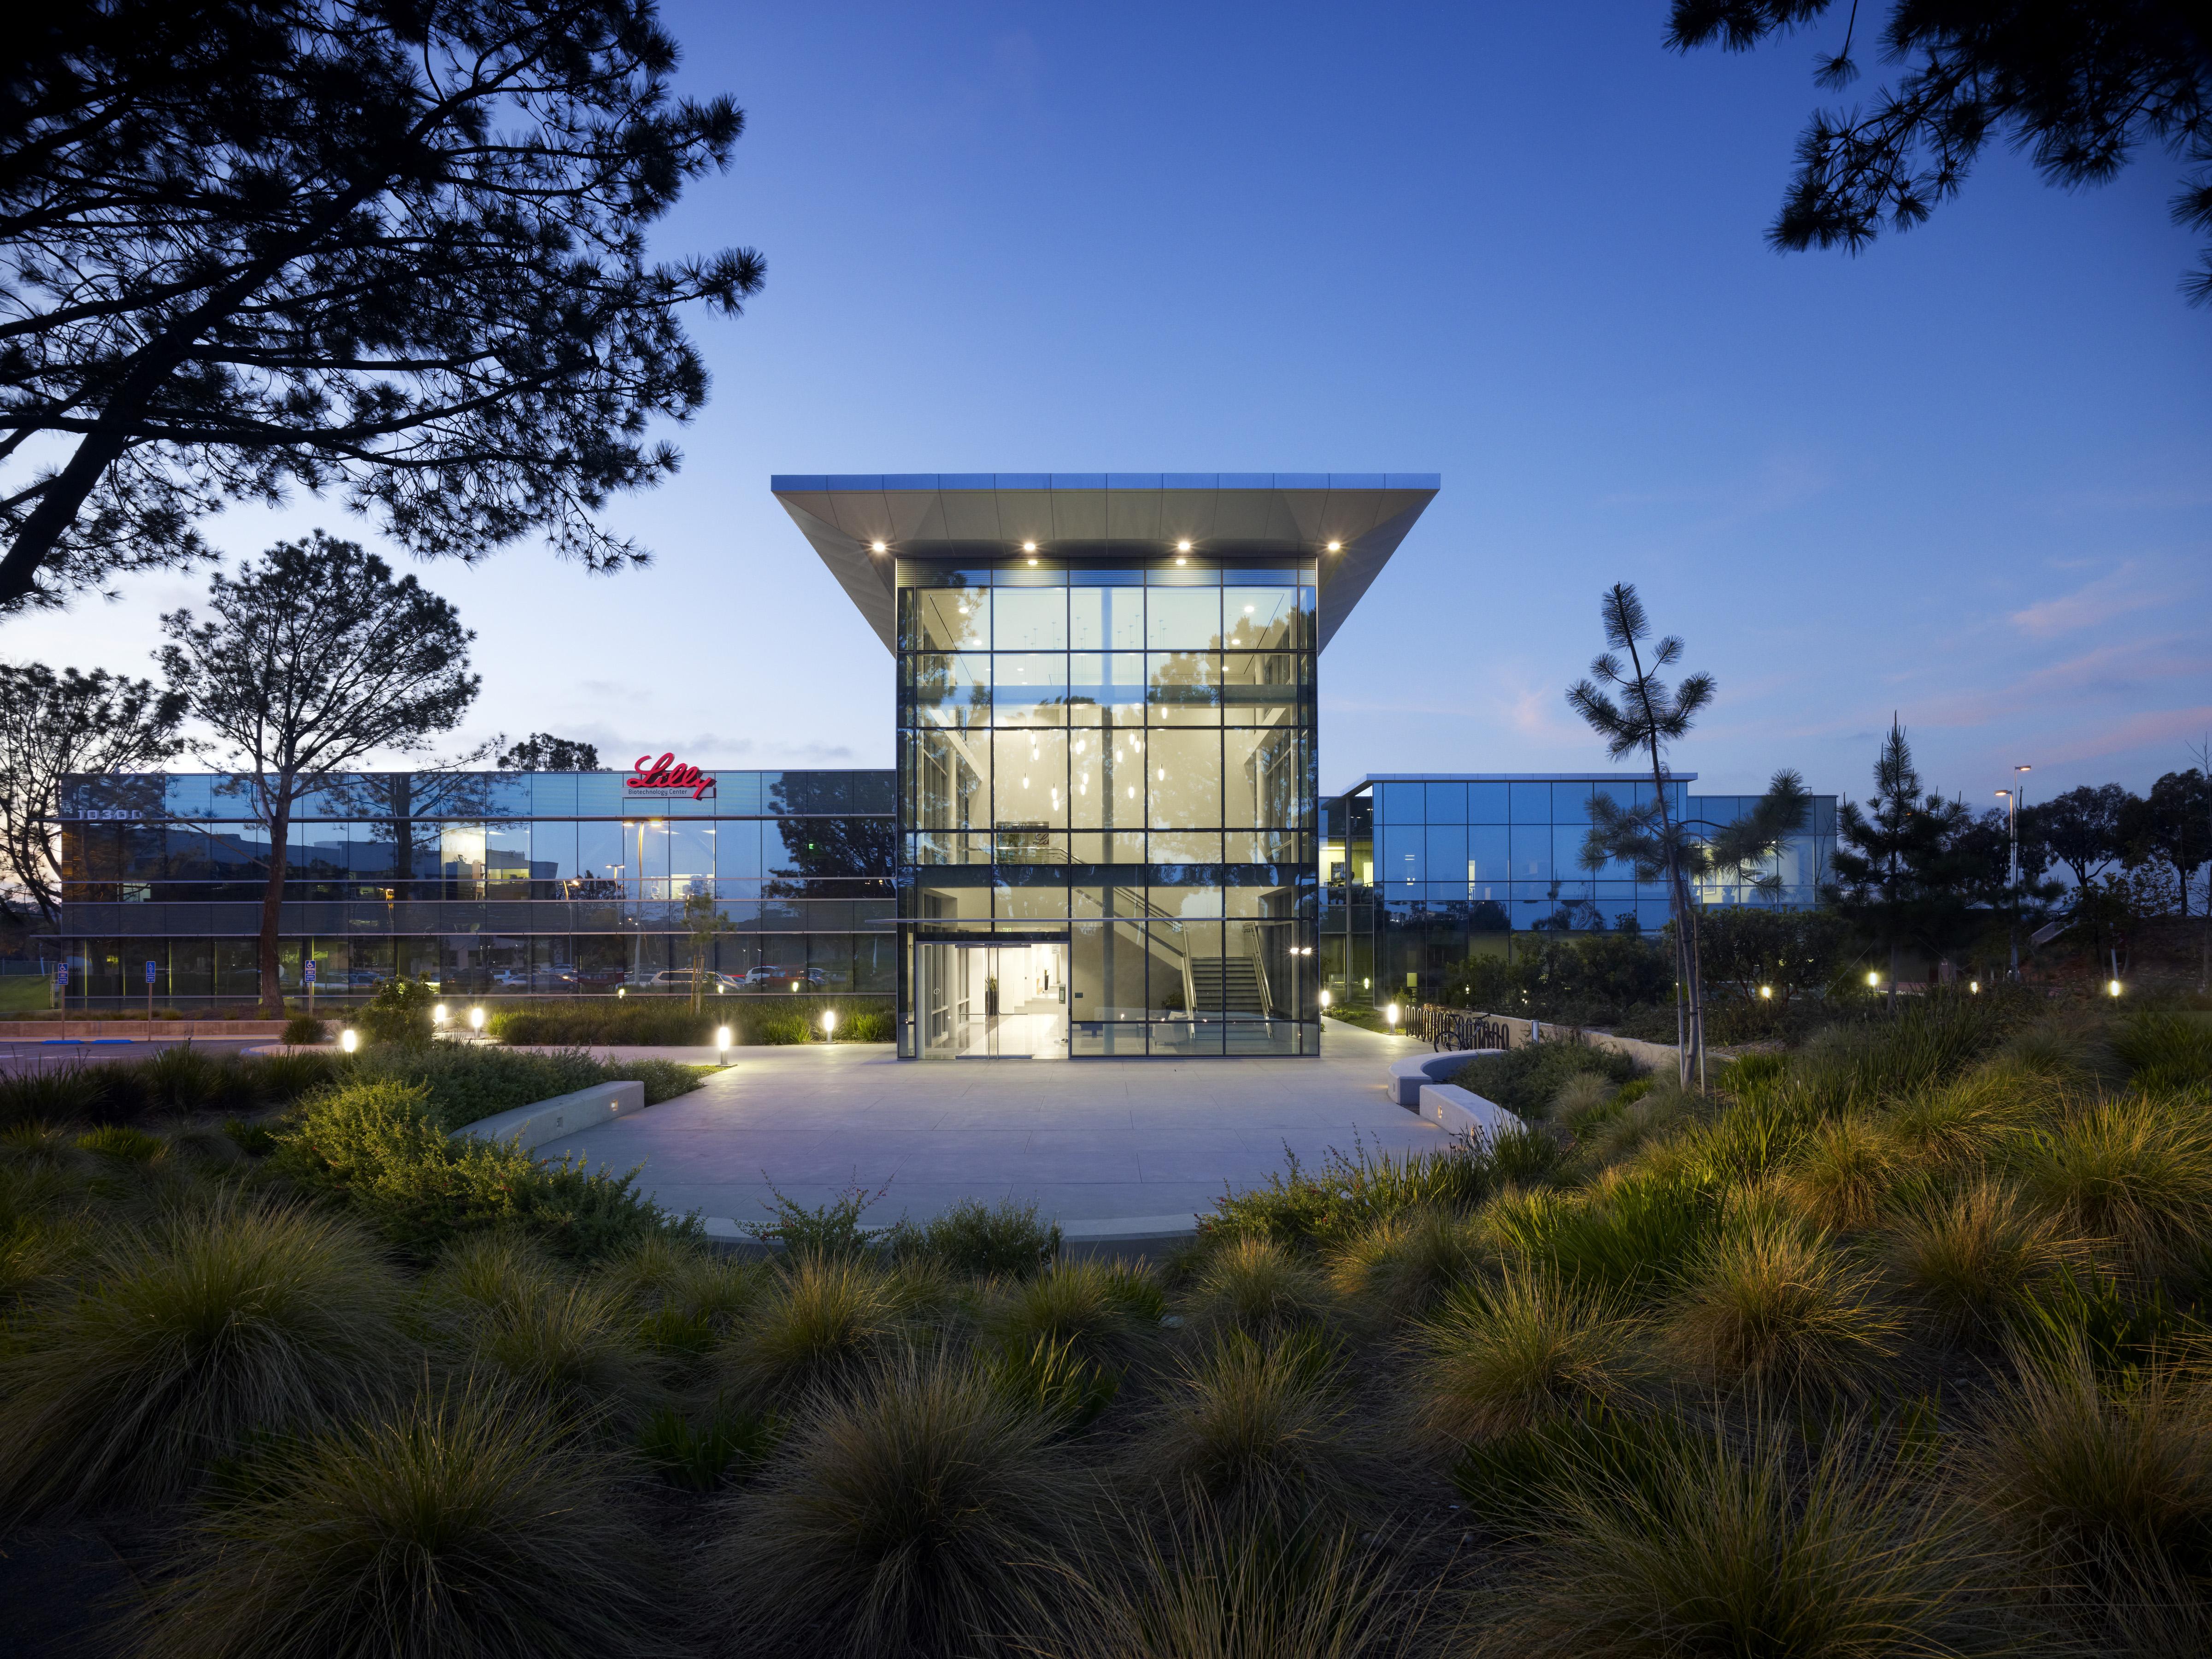 alexandria real estate Campus Pointe, California